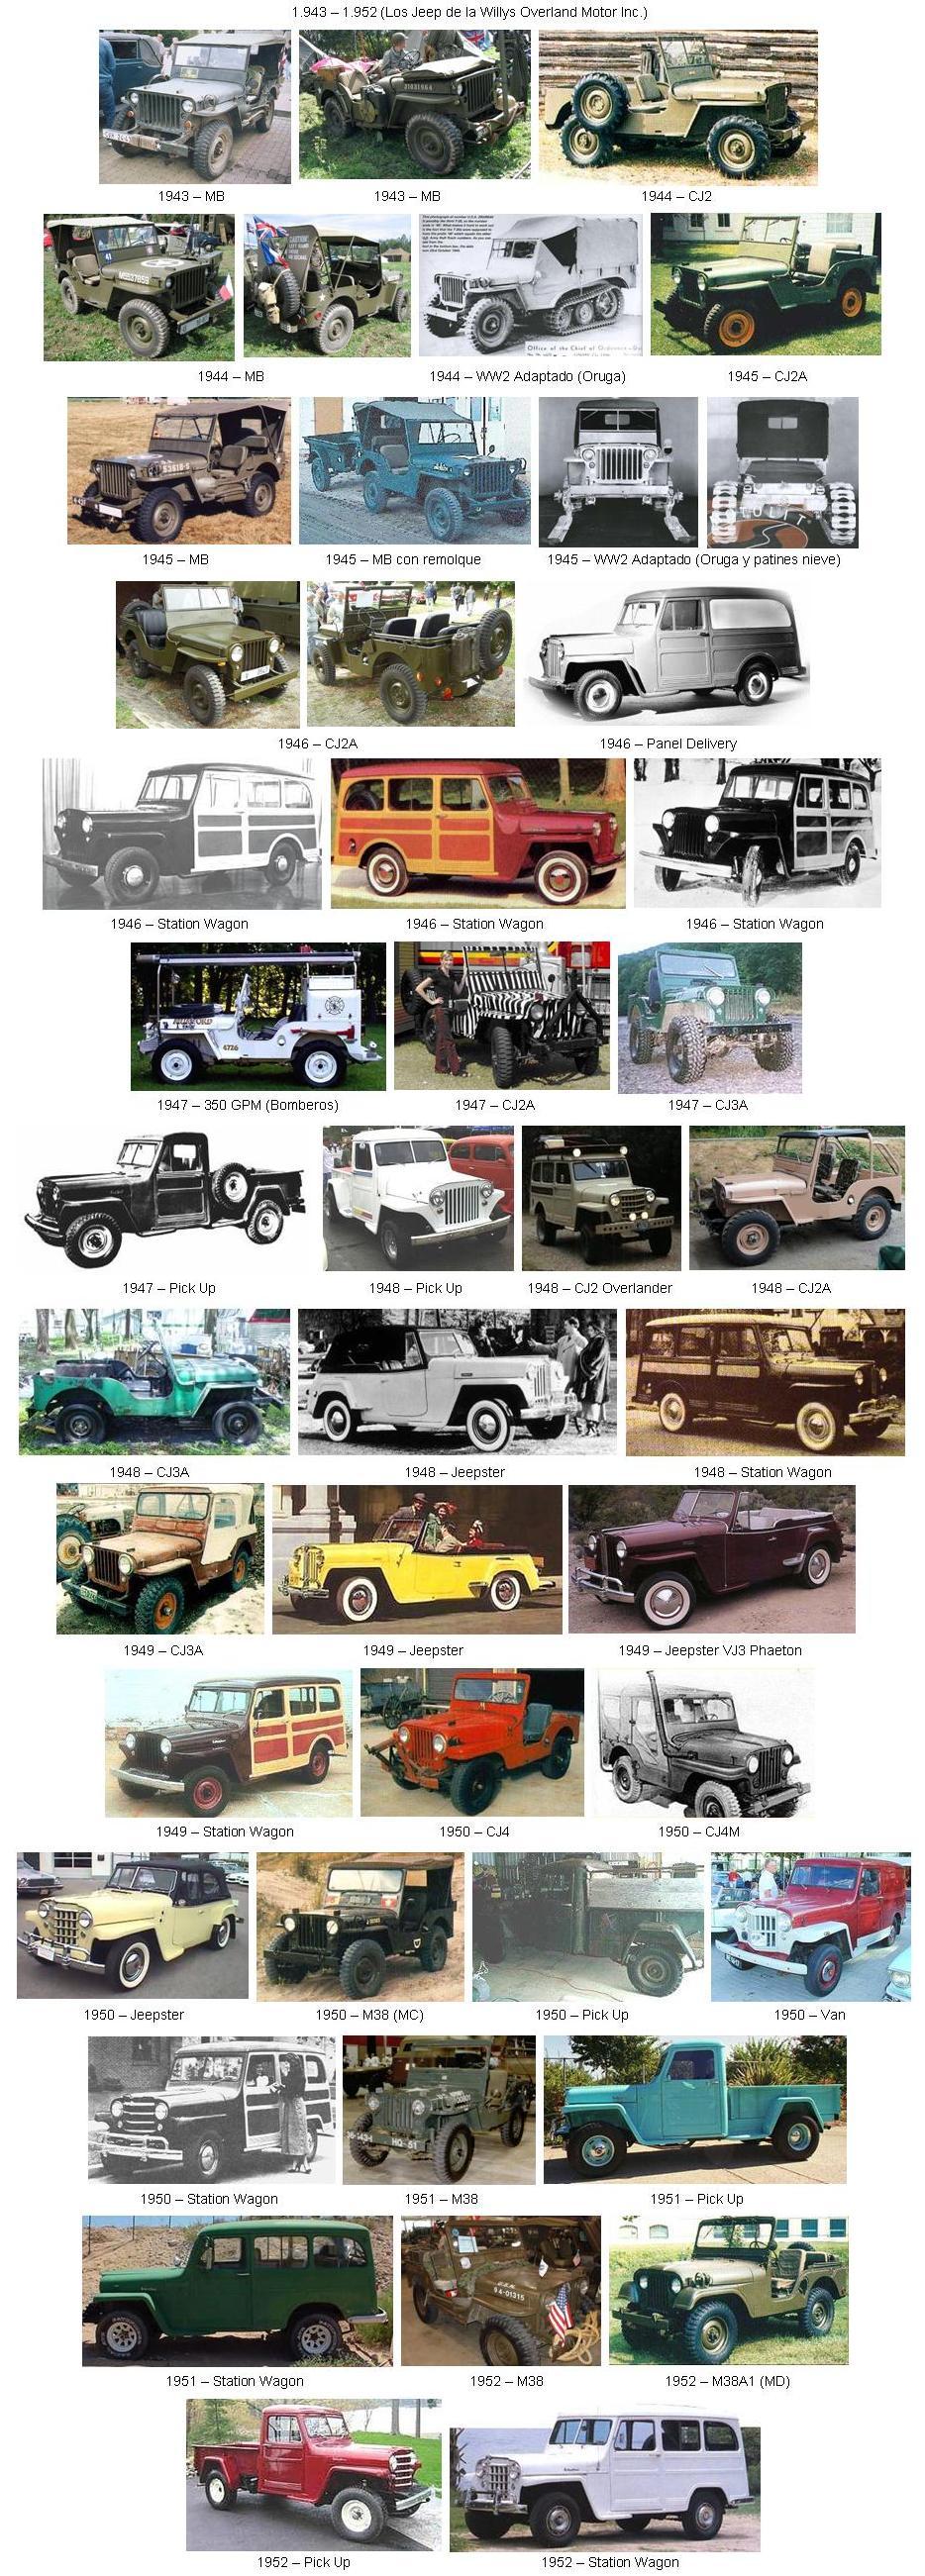 JEEP-02-(1943-1952)-(Willys Overland Motor Inc.).JPG